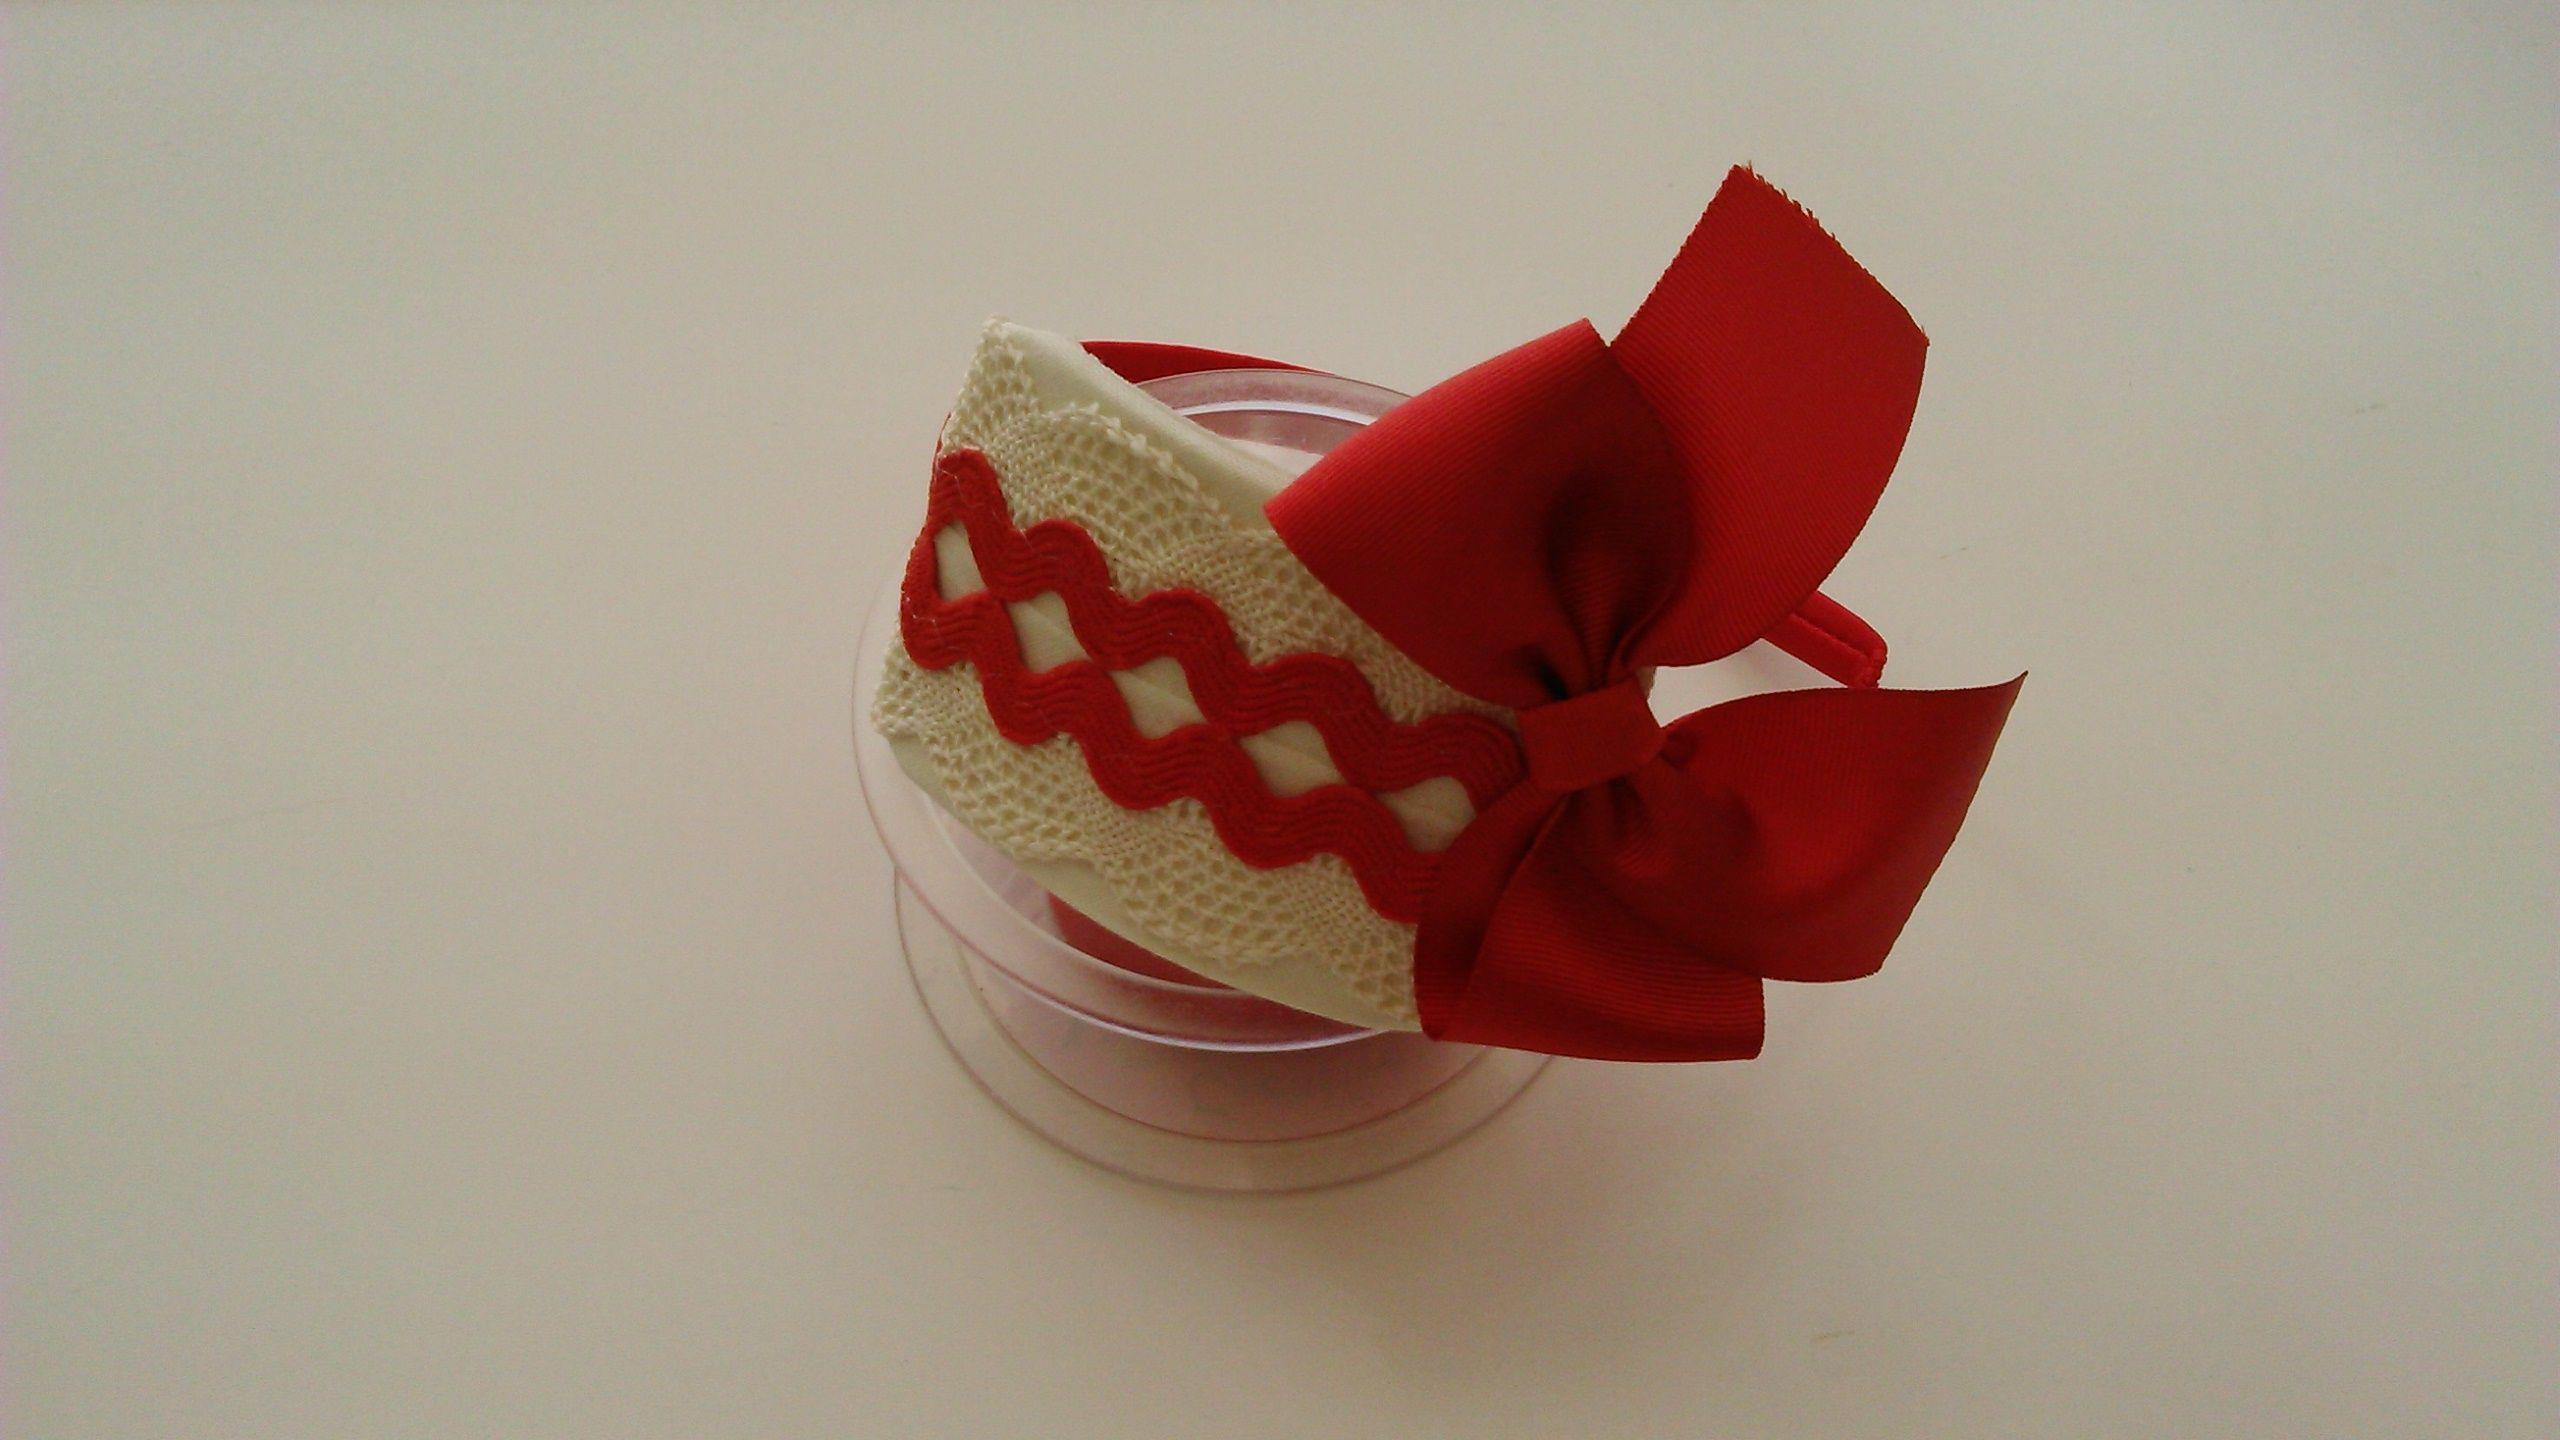 Diadema roja y cruda diademas - Diademas de encaje ...